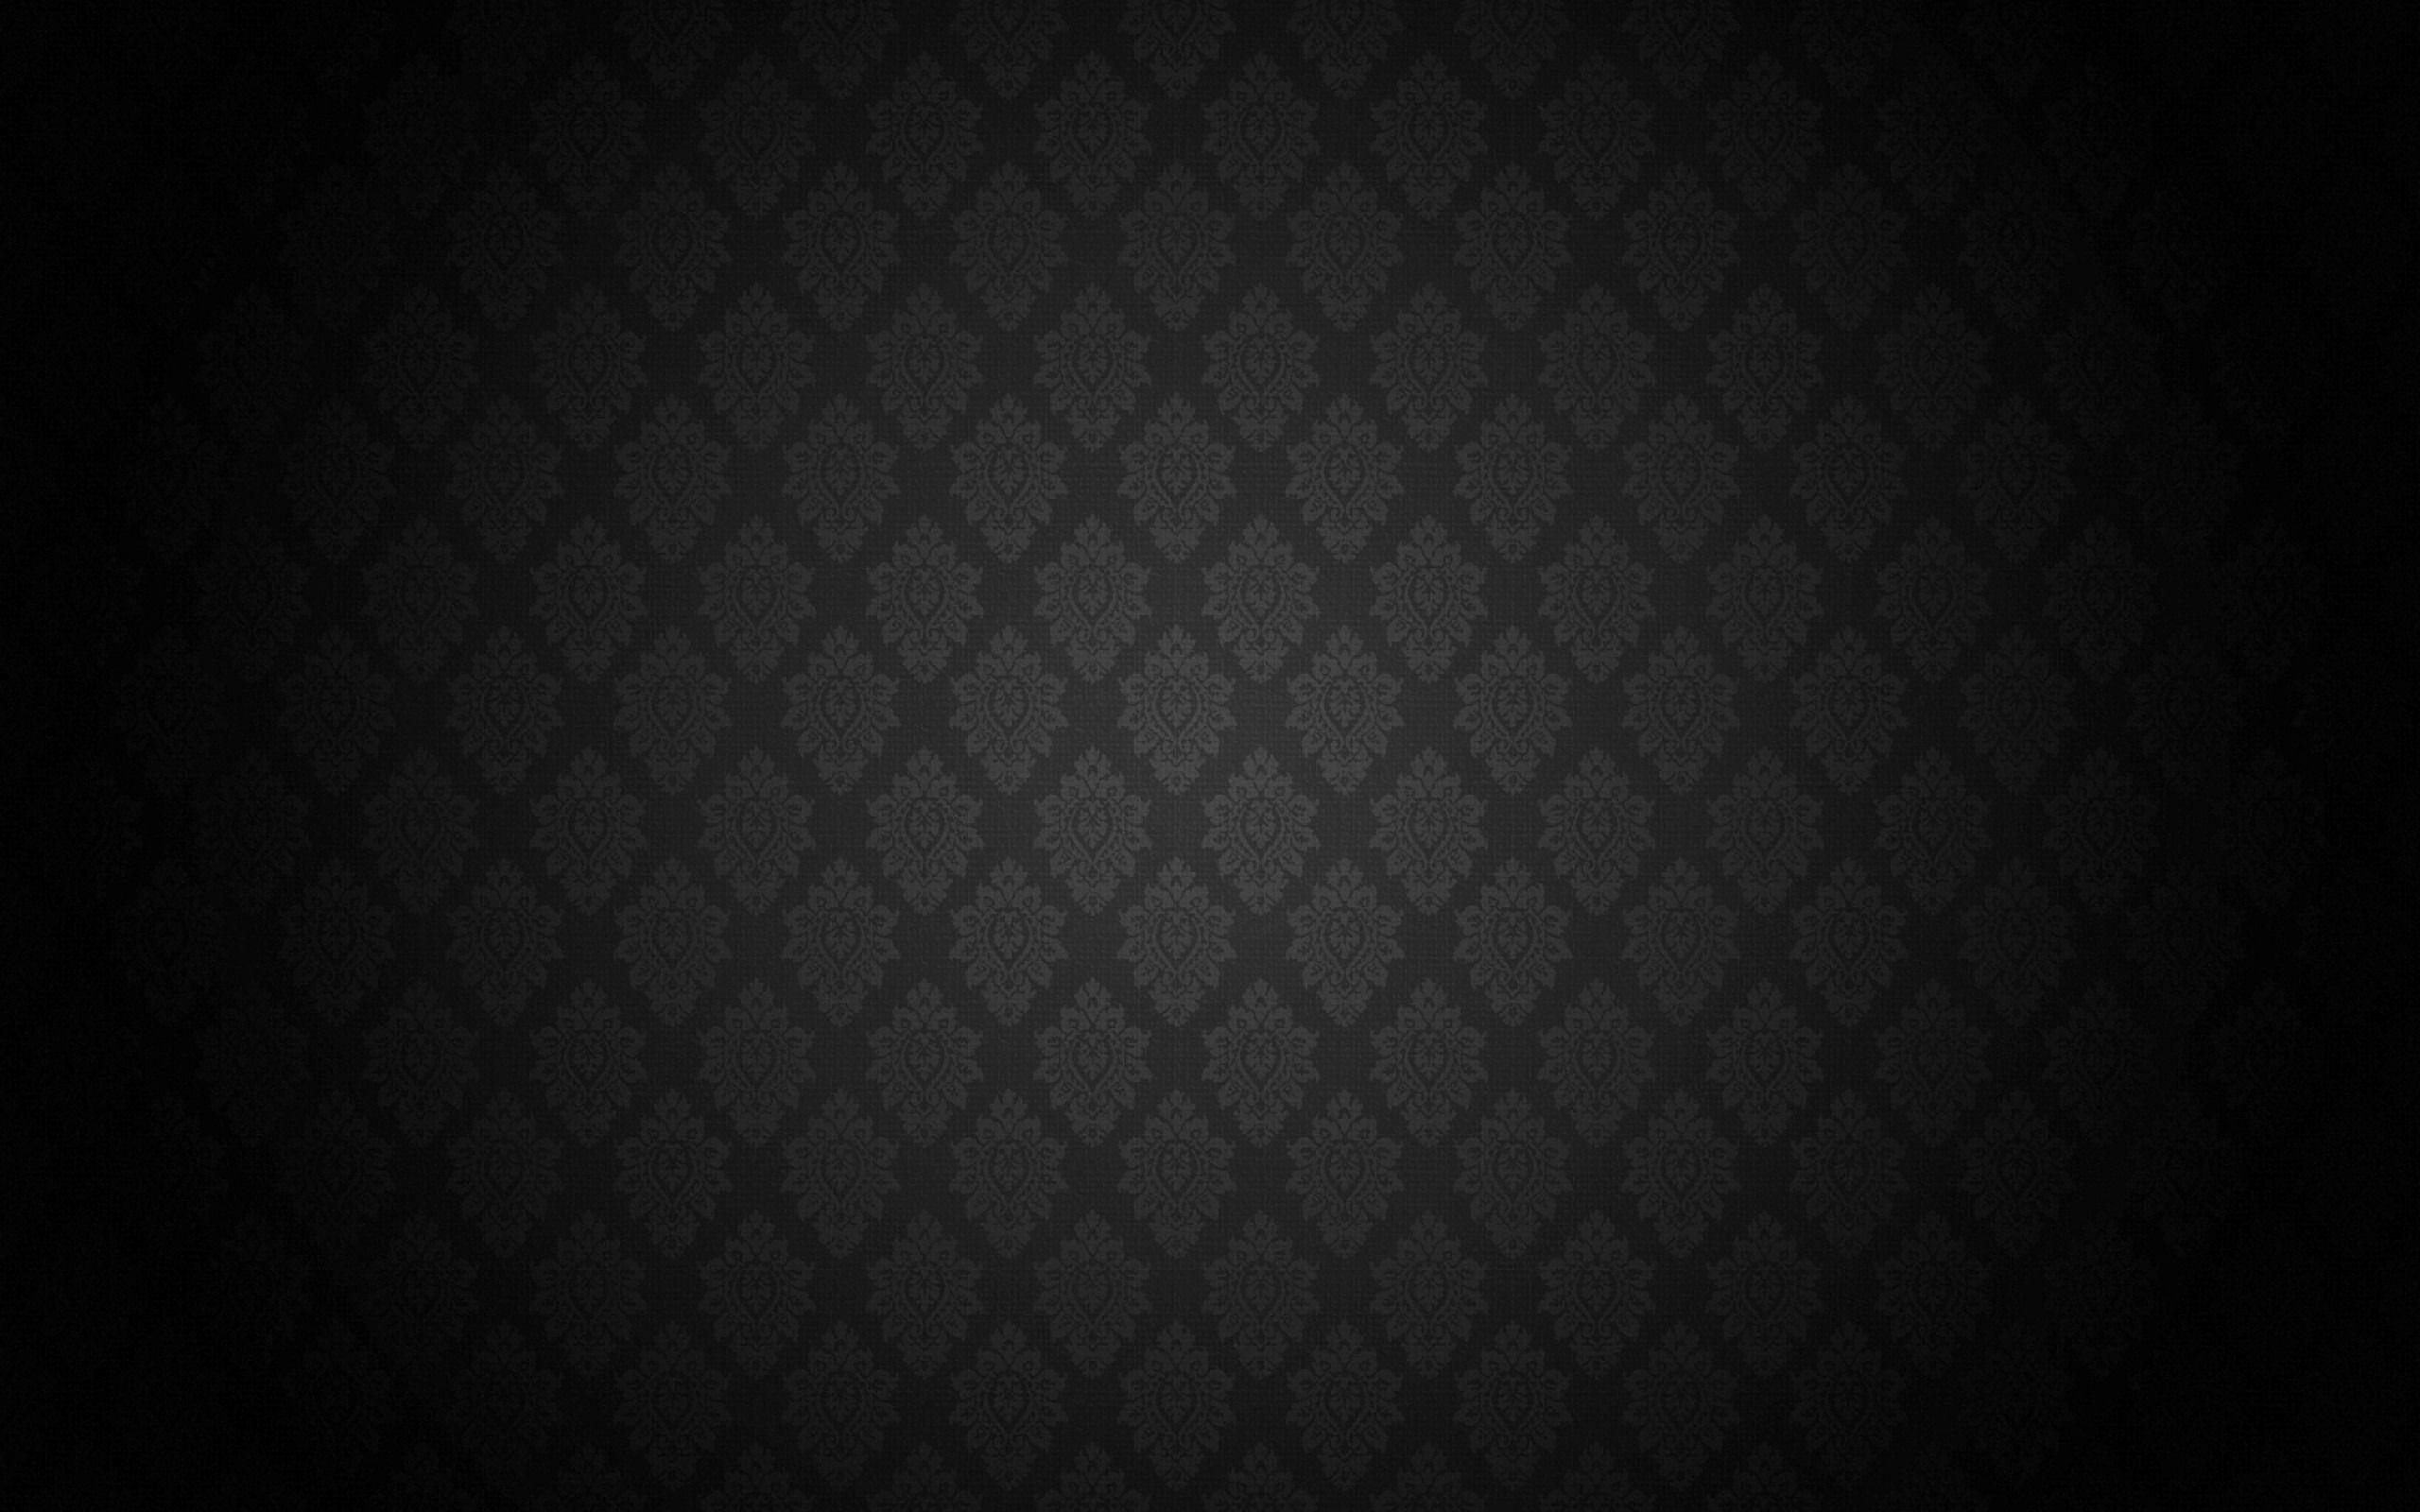 Black Background Design Best Wallpaper Hd Background Hd Wallpaper Black Wallpaper White Pattern Background